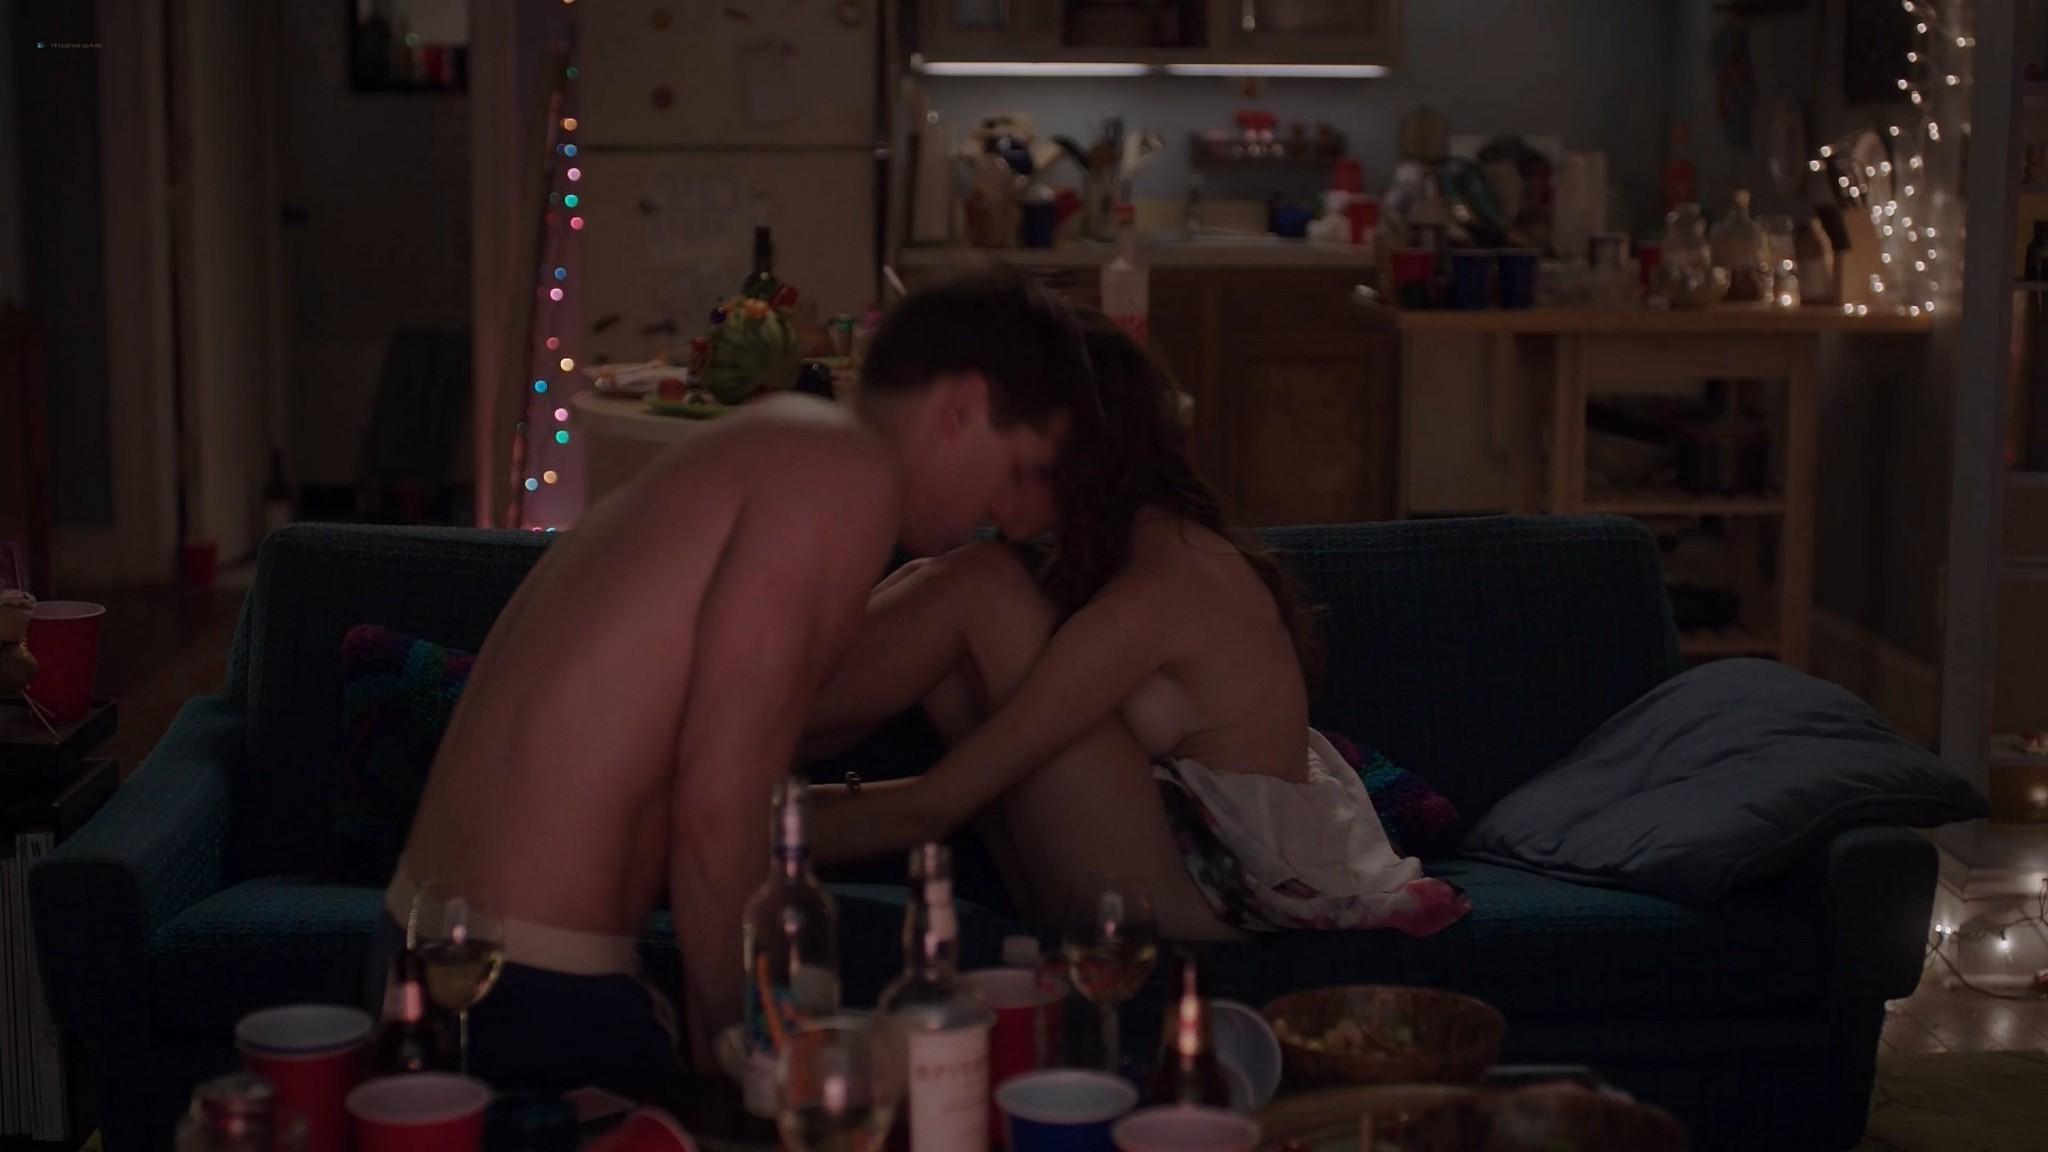 Allison Williams sex Lena Dunham nude Zosia Mamet hot Jemima Kirke nude Girls 2012 s2e1 5 1080p Web 2